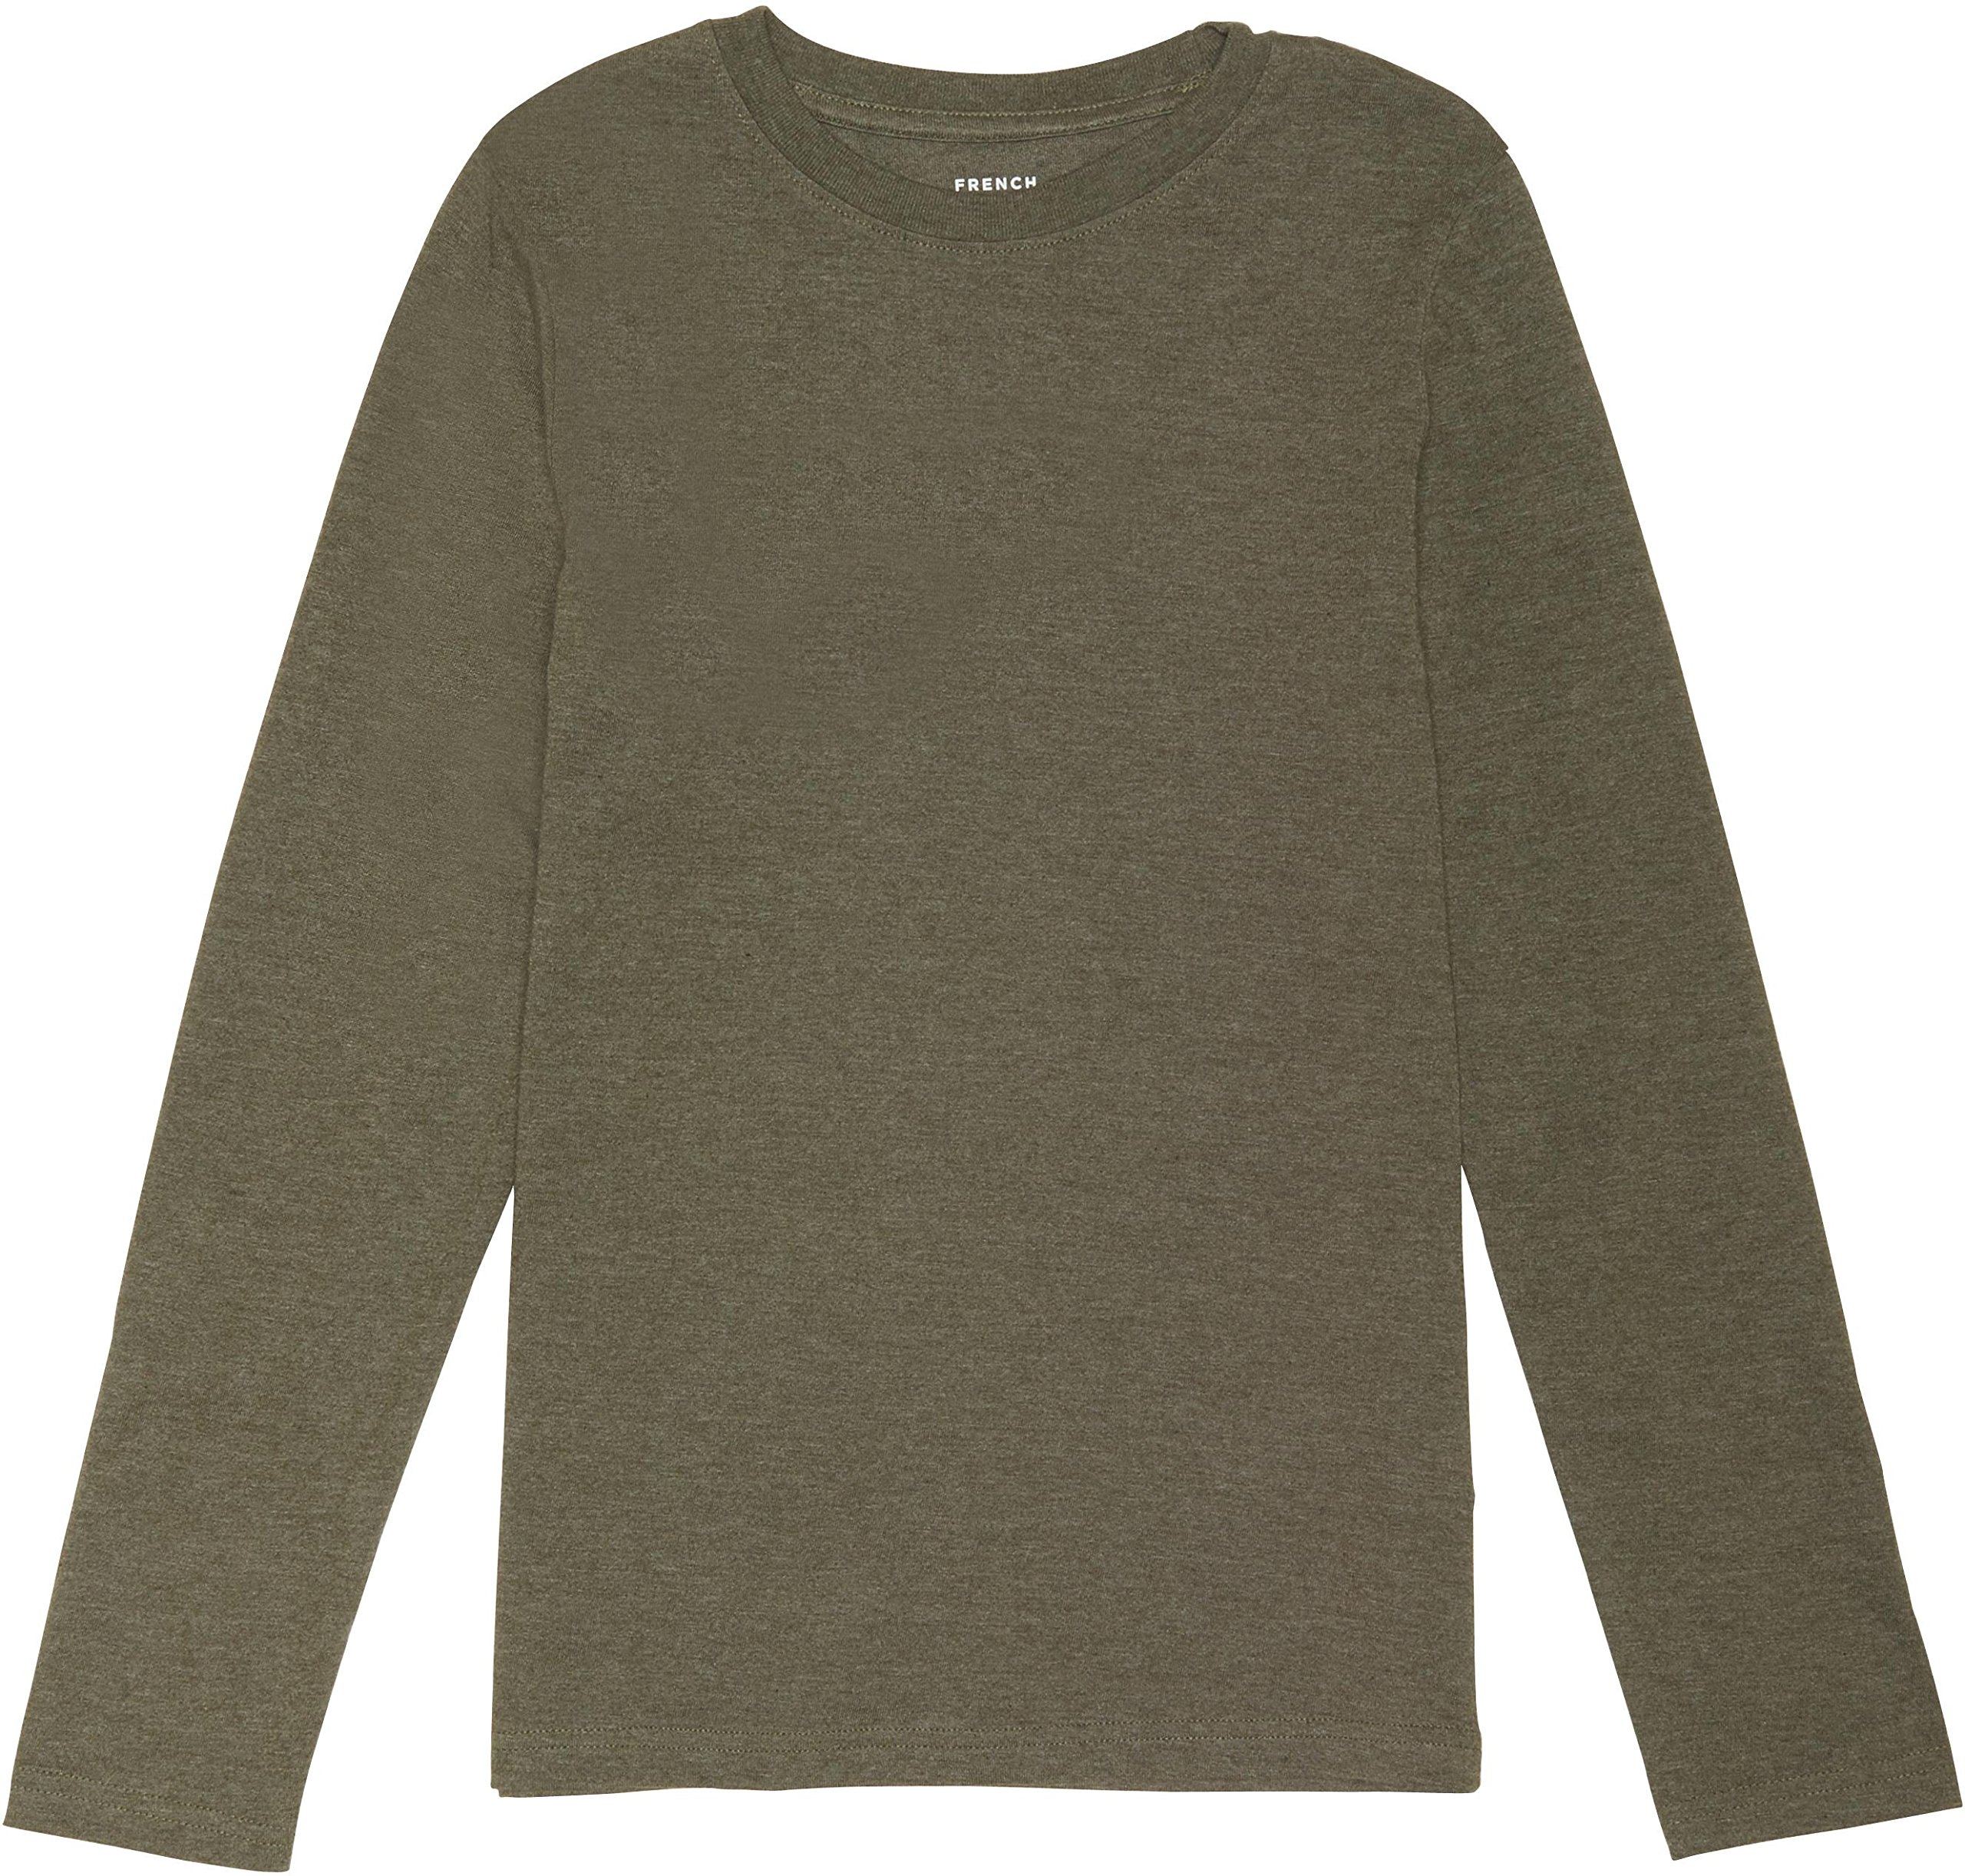 French Toast School Uniform Boys Long Sleeve Crewneck T-Shirt, Ivy Green Heather, Large (10/12)